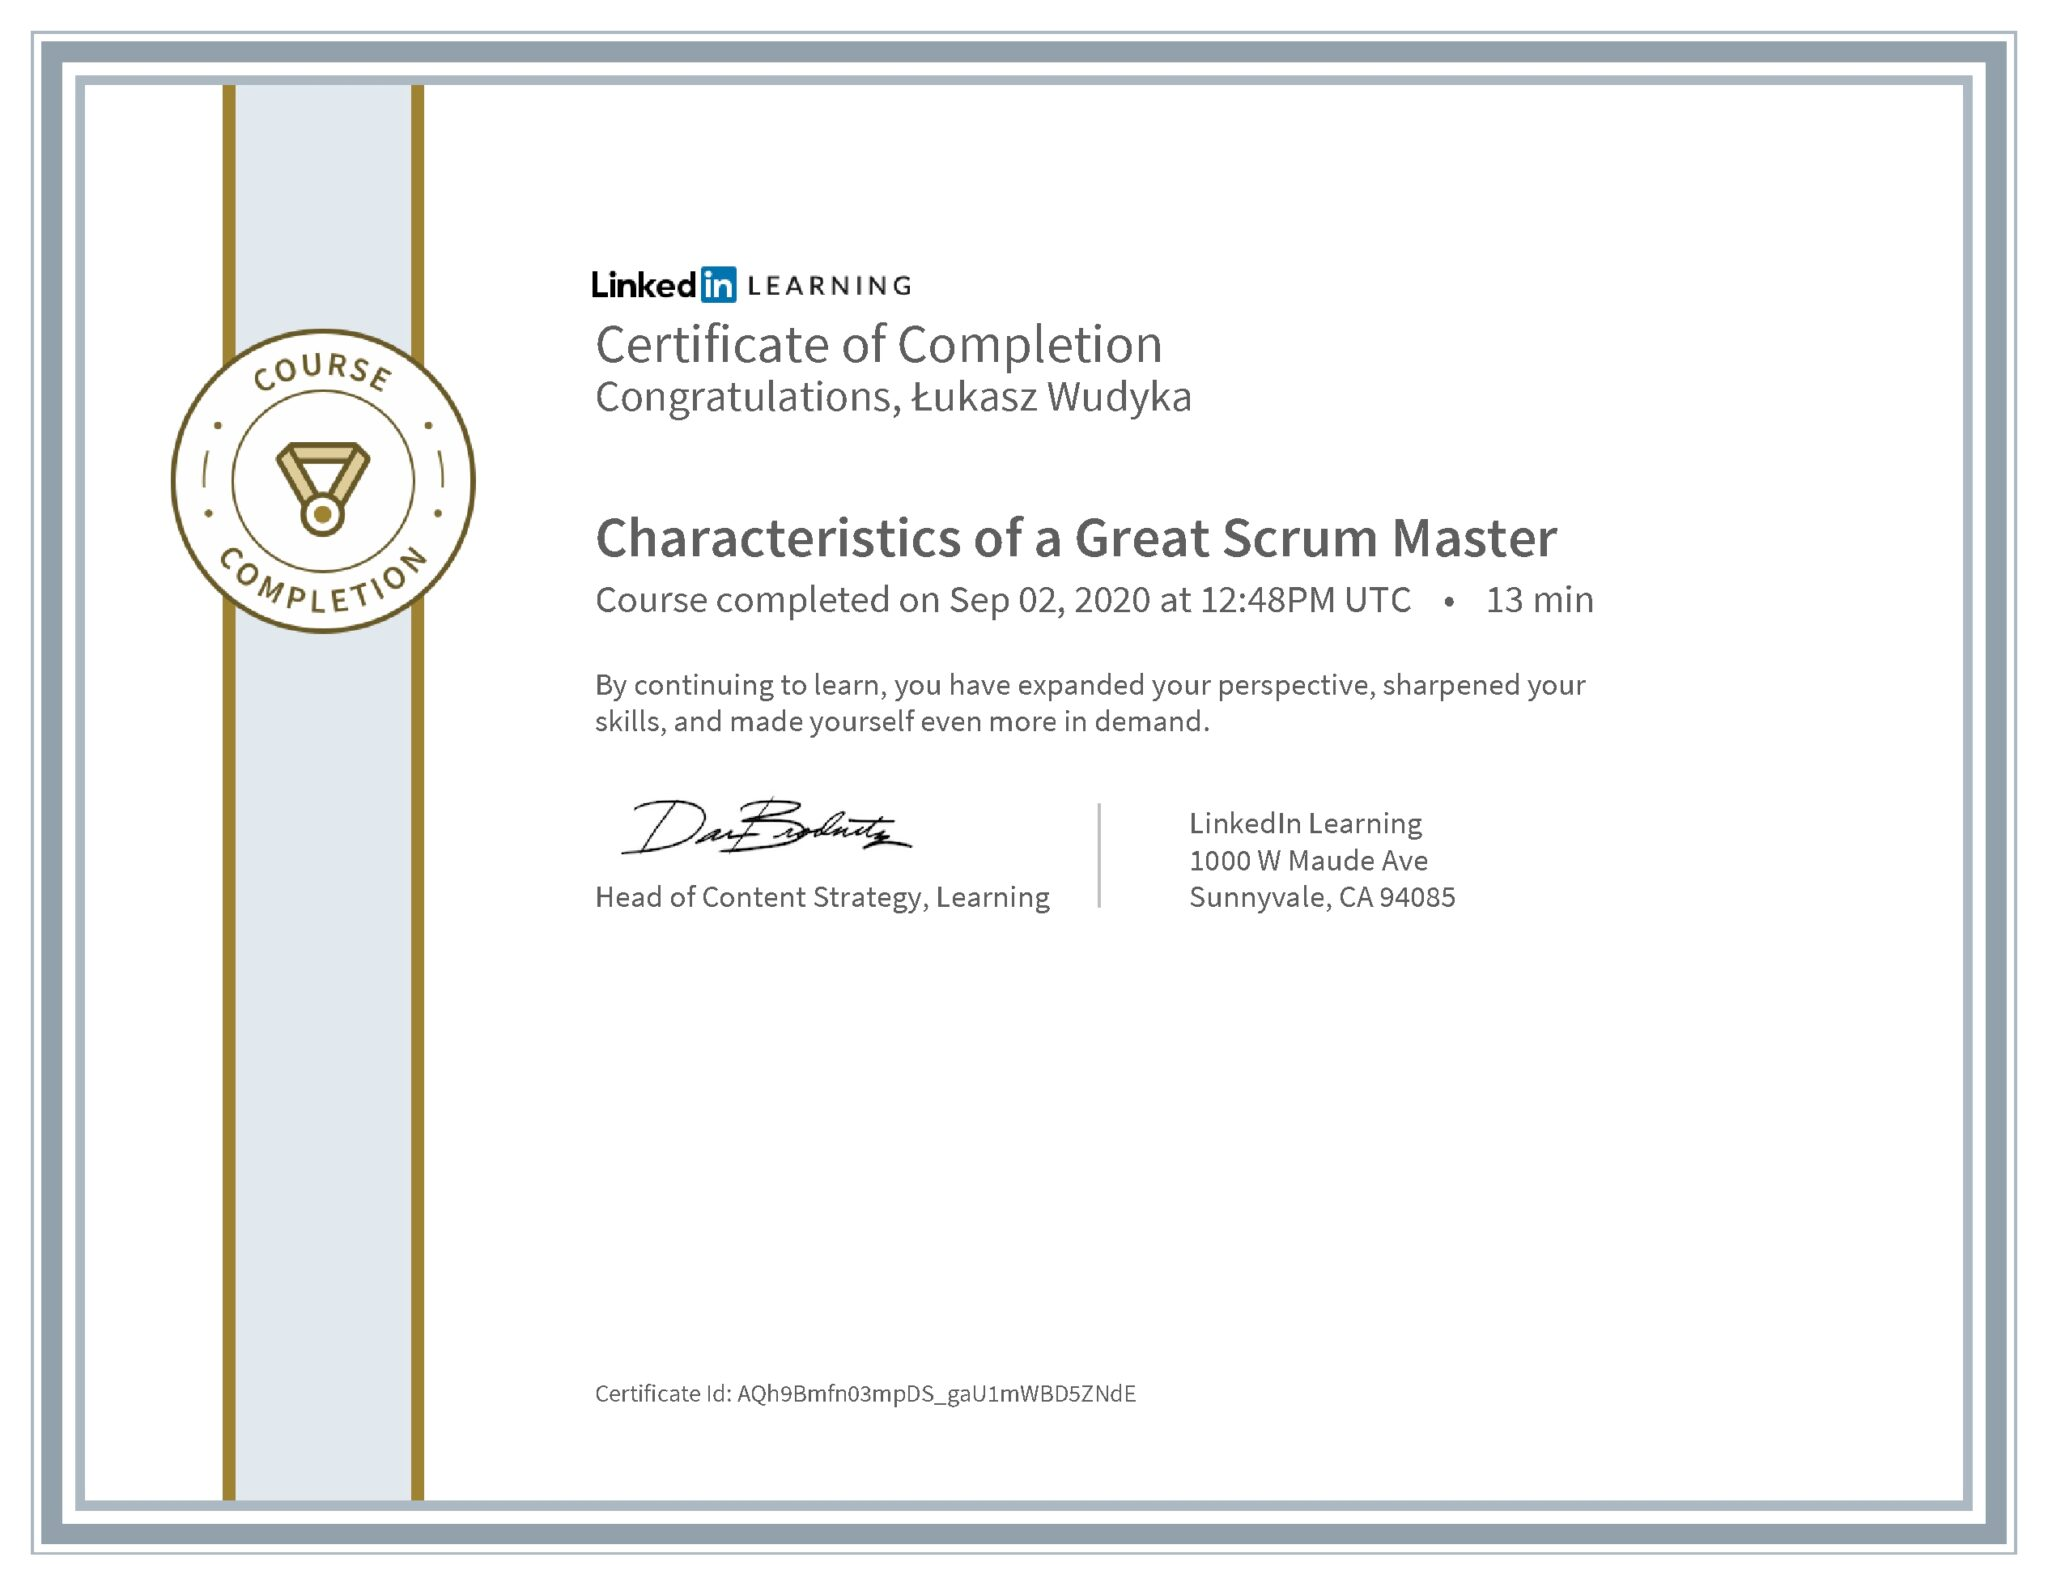 Łukasz Wudyka certyfikat LinkedIn Characteristics of a Great Scrum Master